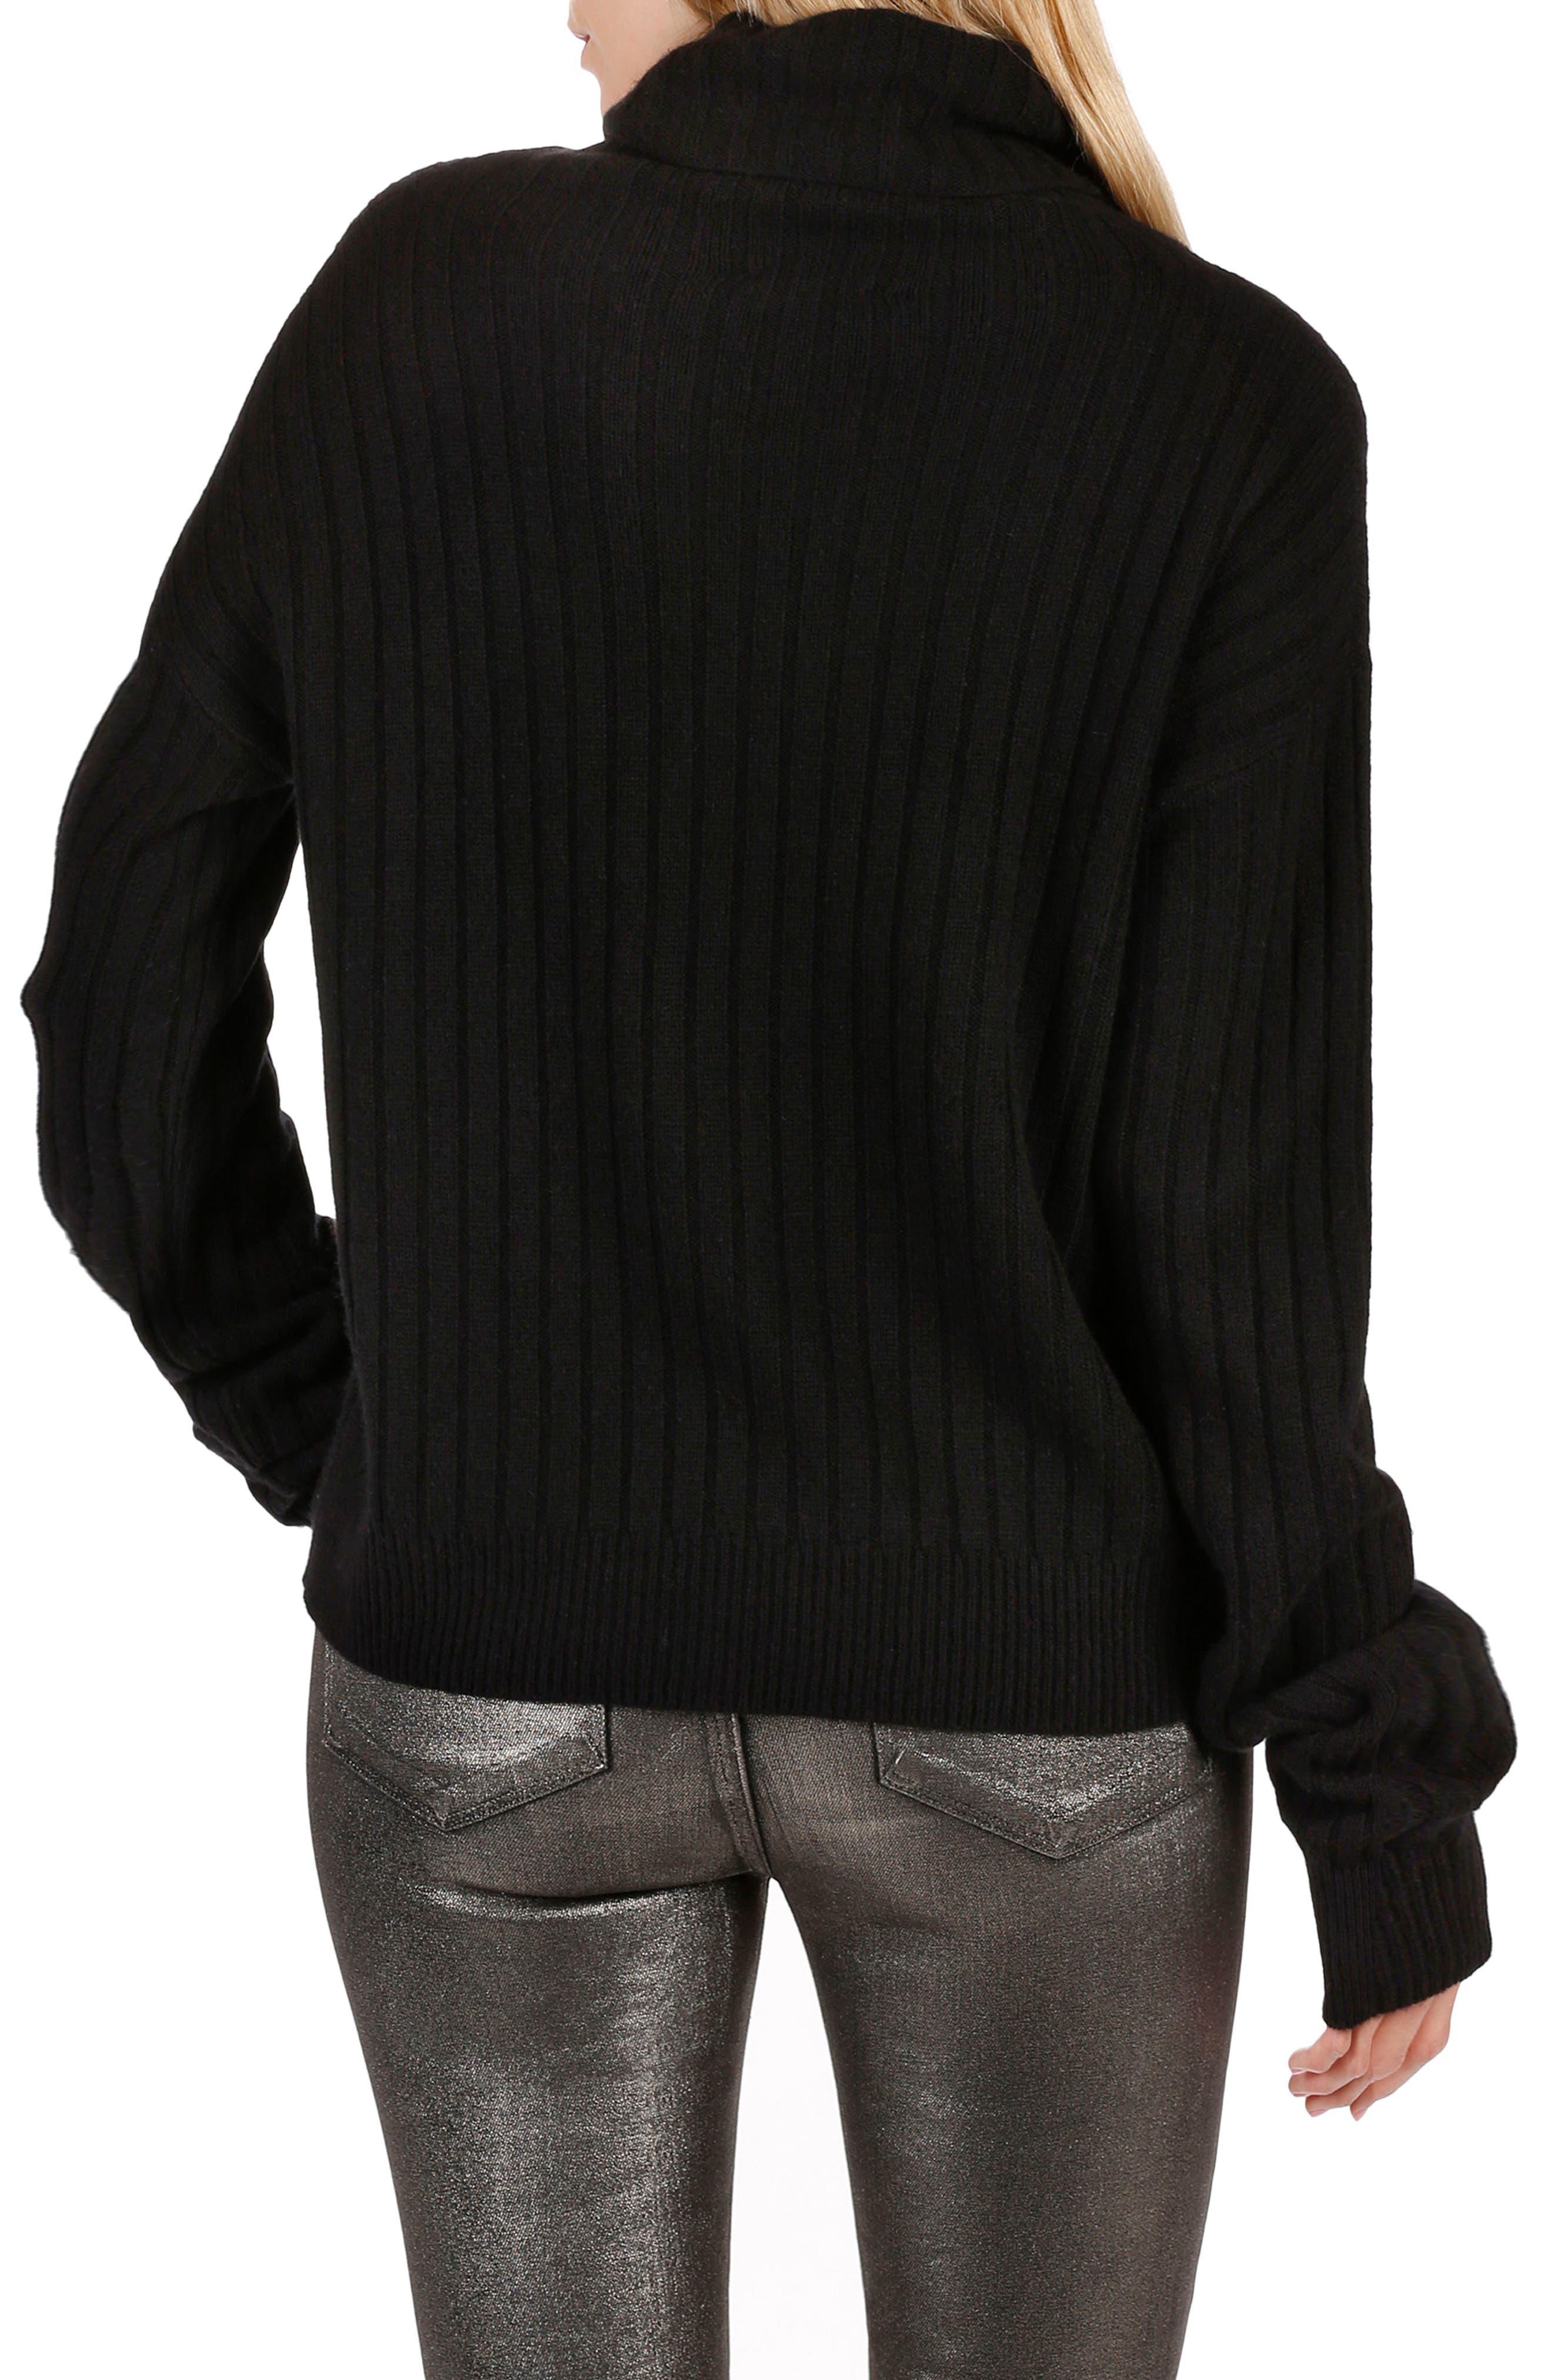 Rosie HW x PAIGE Mina Turtleneck Sweater,                             Alternate thumbnail 2, color,                             001